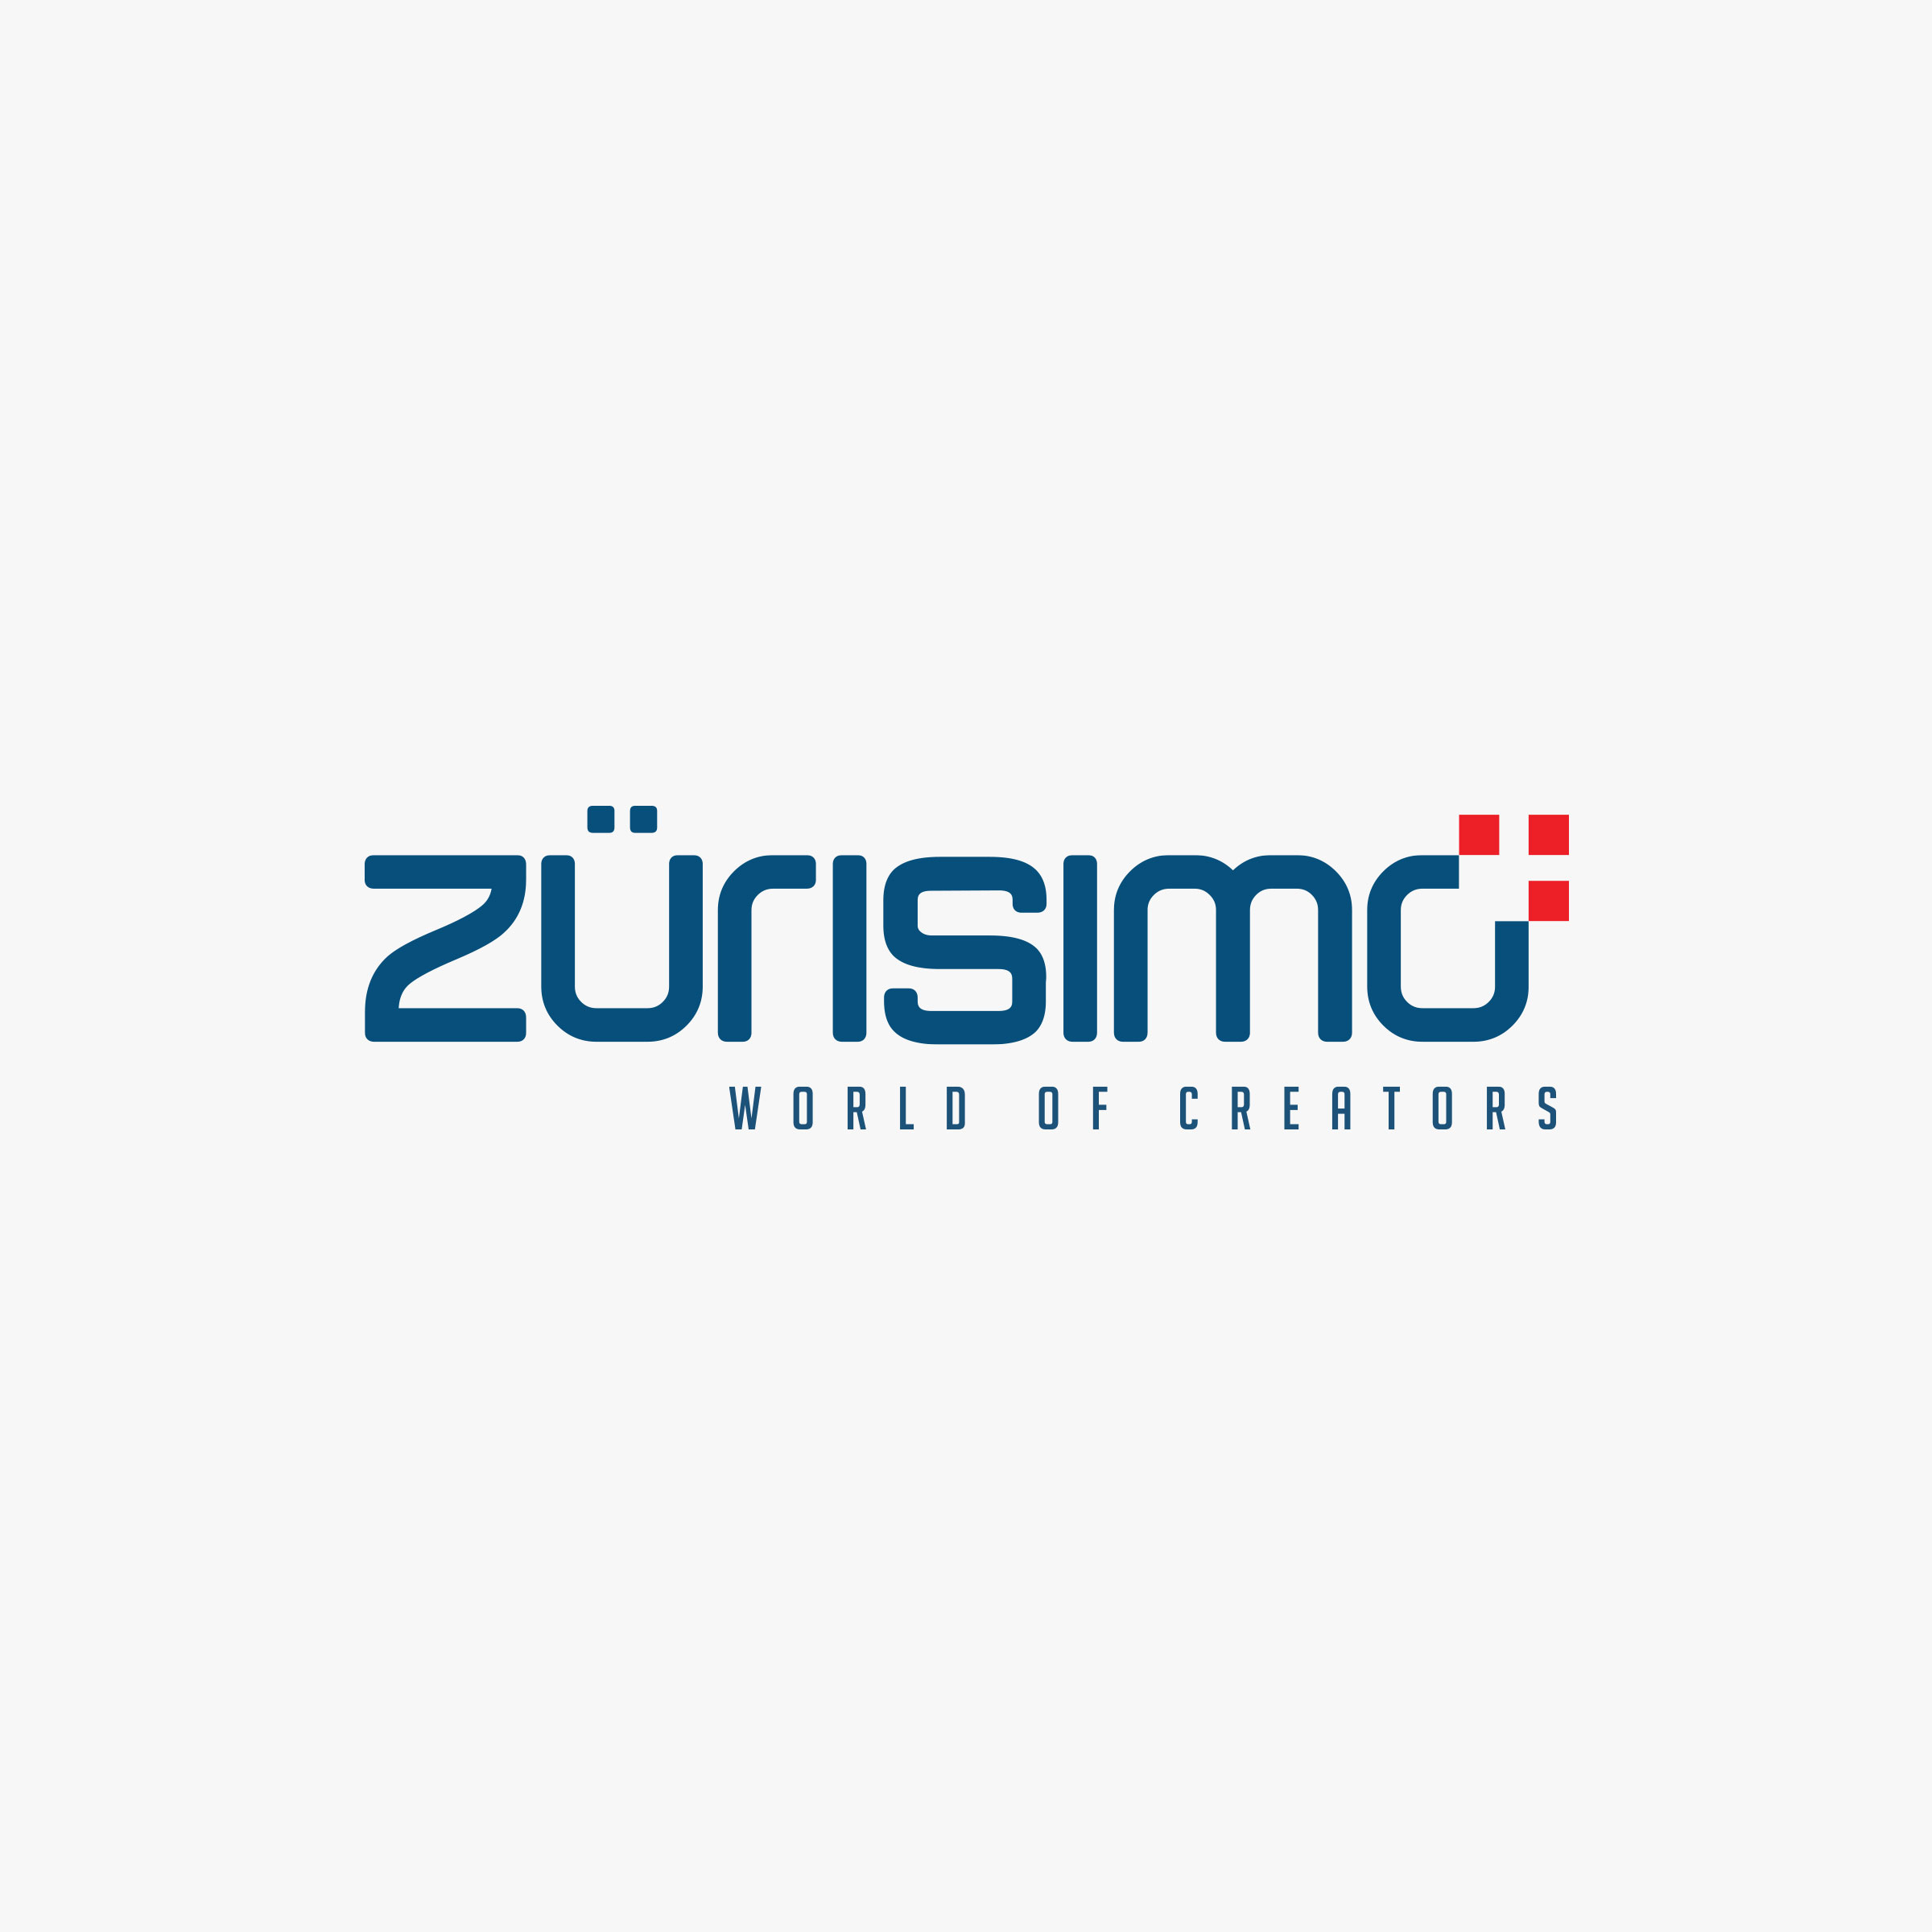 zurisimo-2-logo-design-by-create.jpg